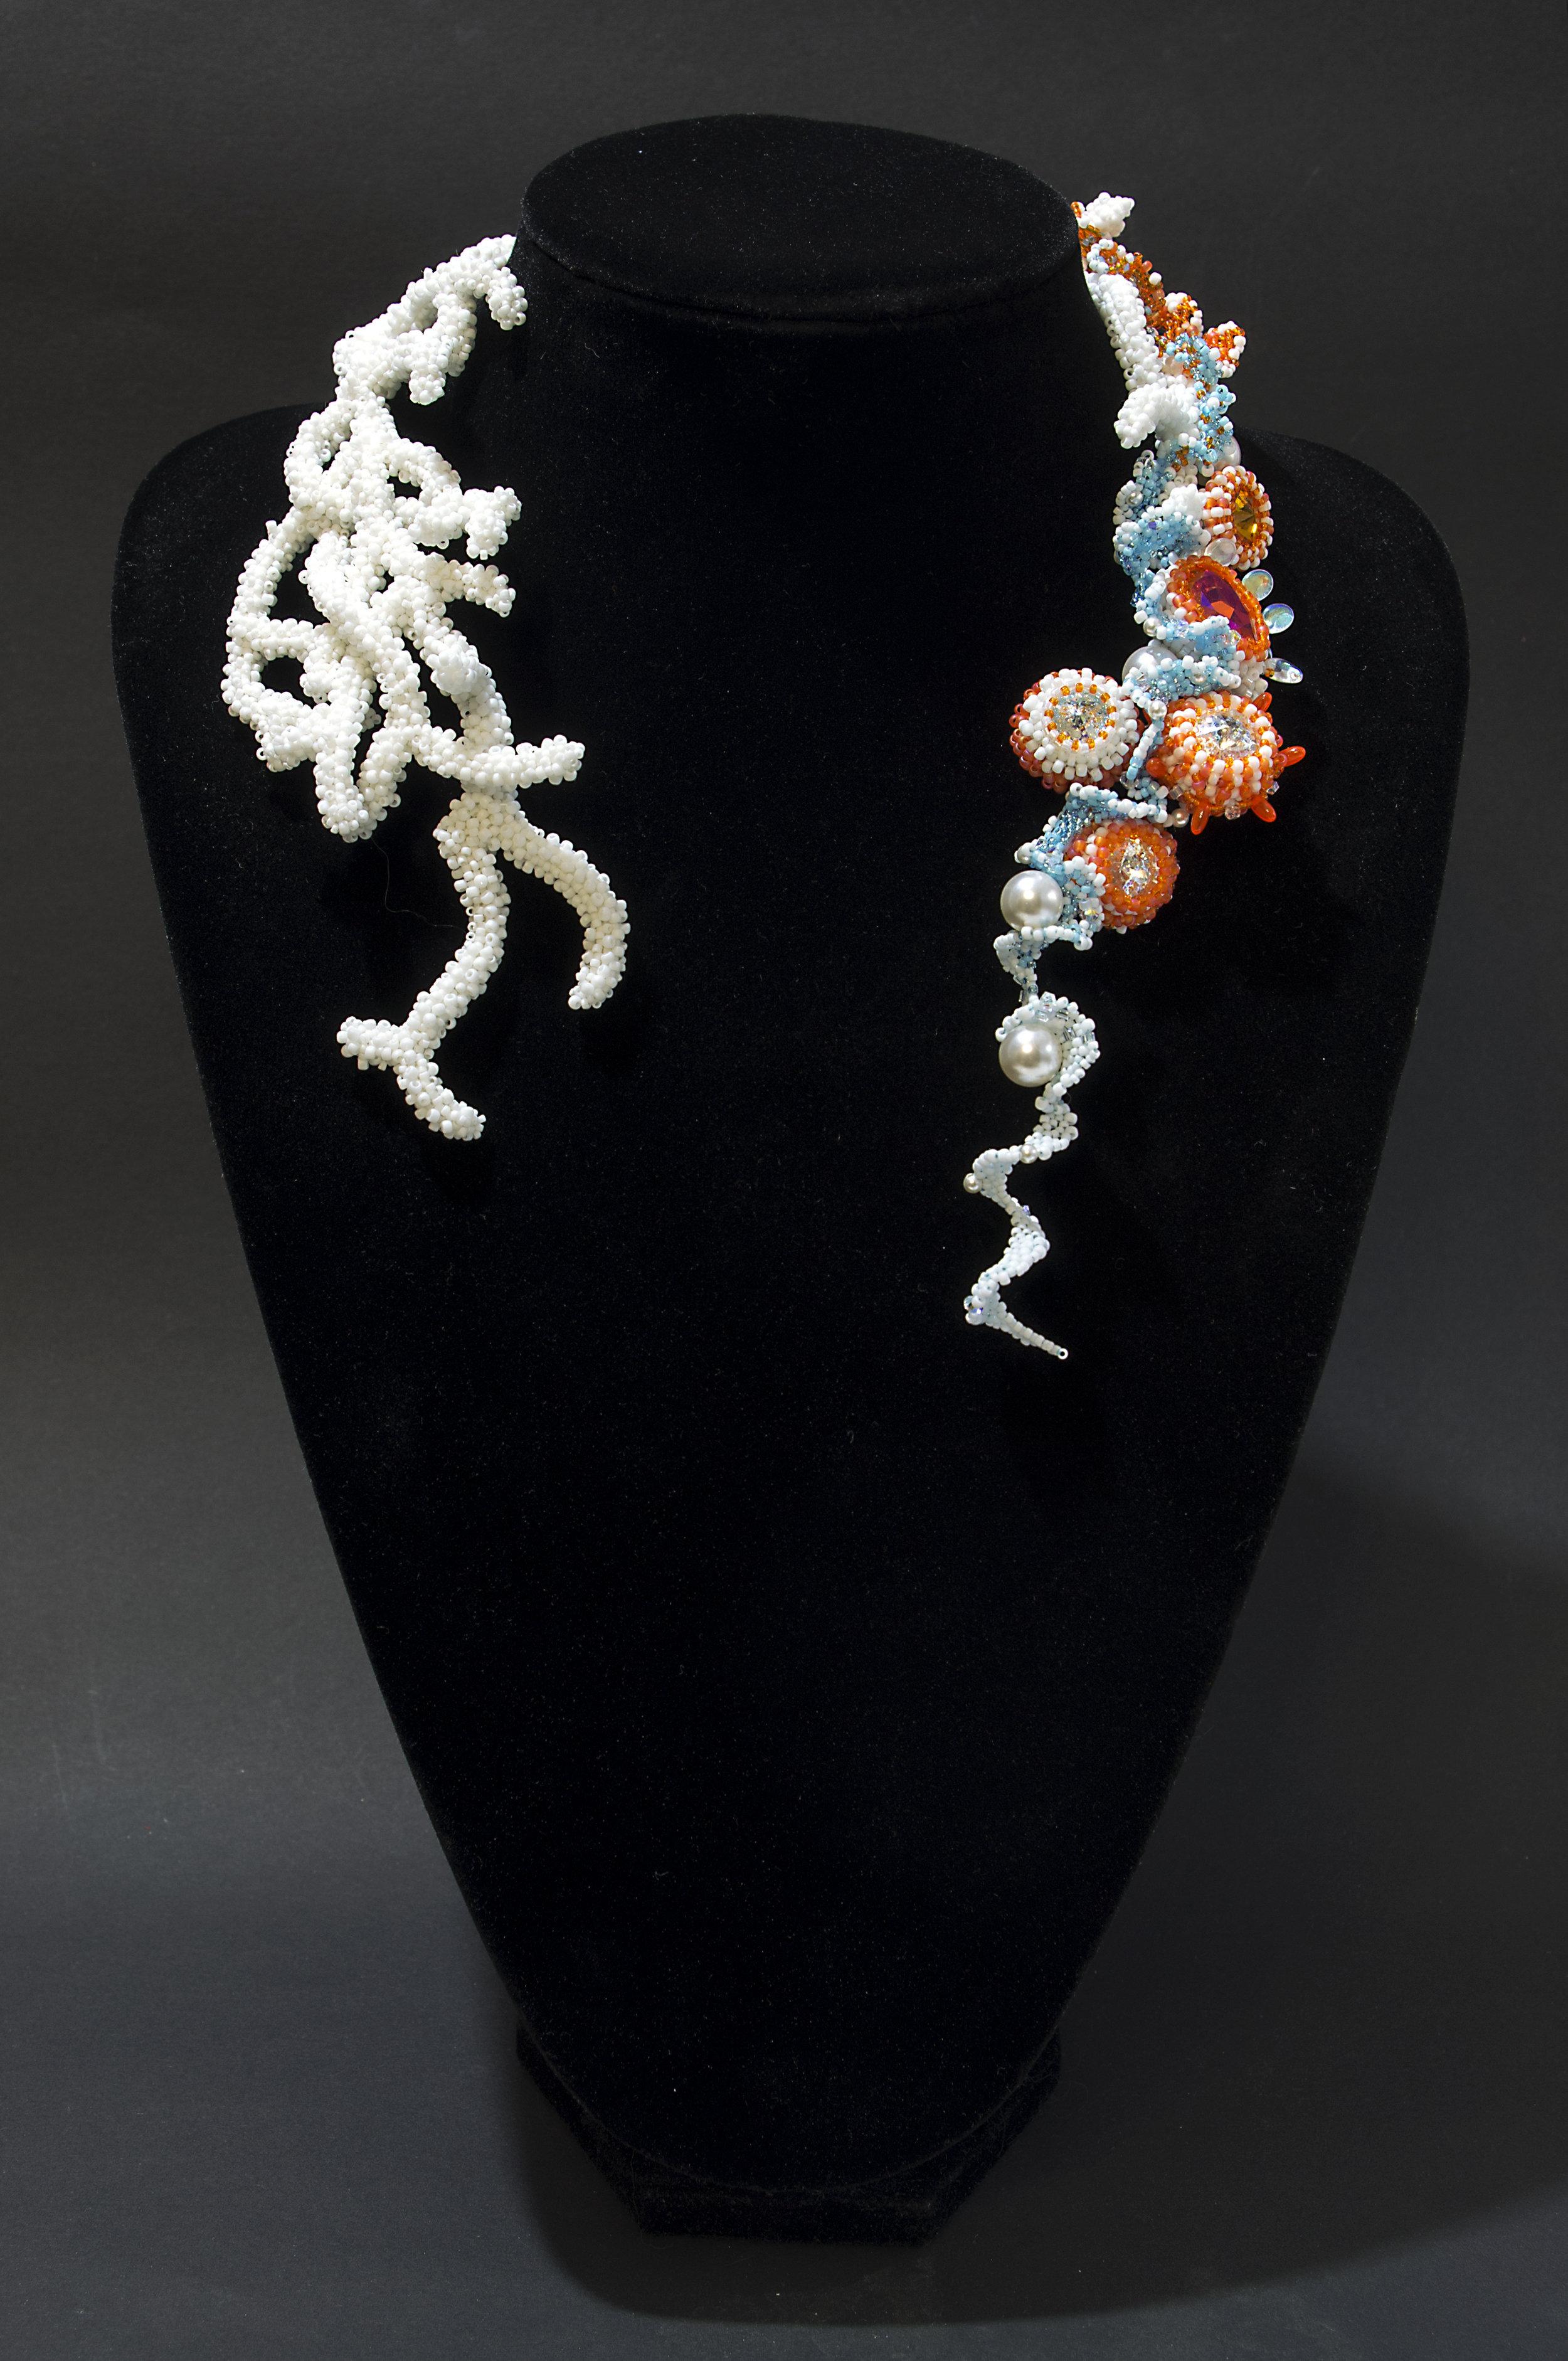 Alexandra Burdina - Prize: Application to the Bead Dreams bead contest